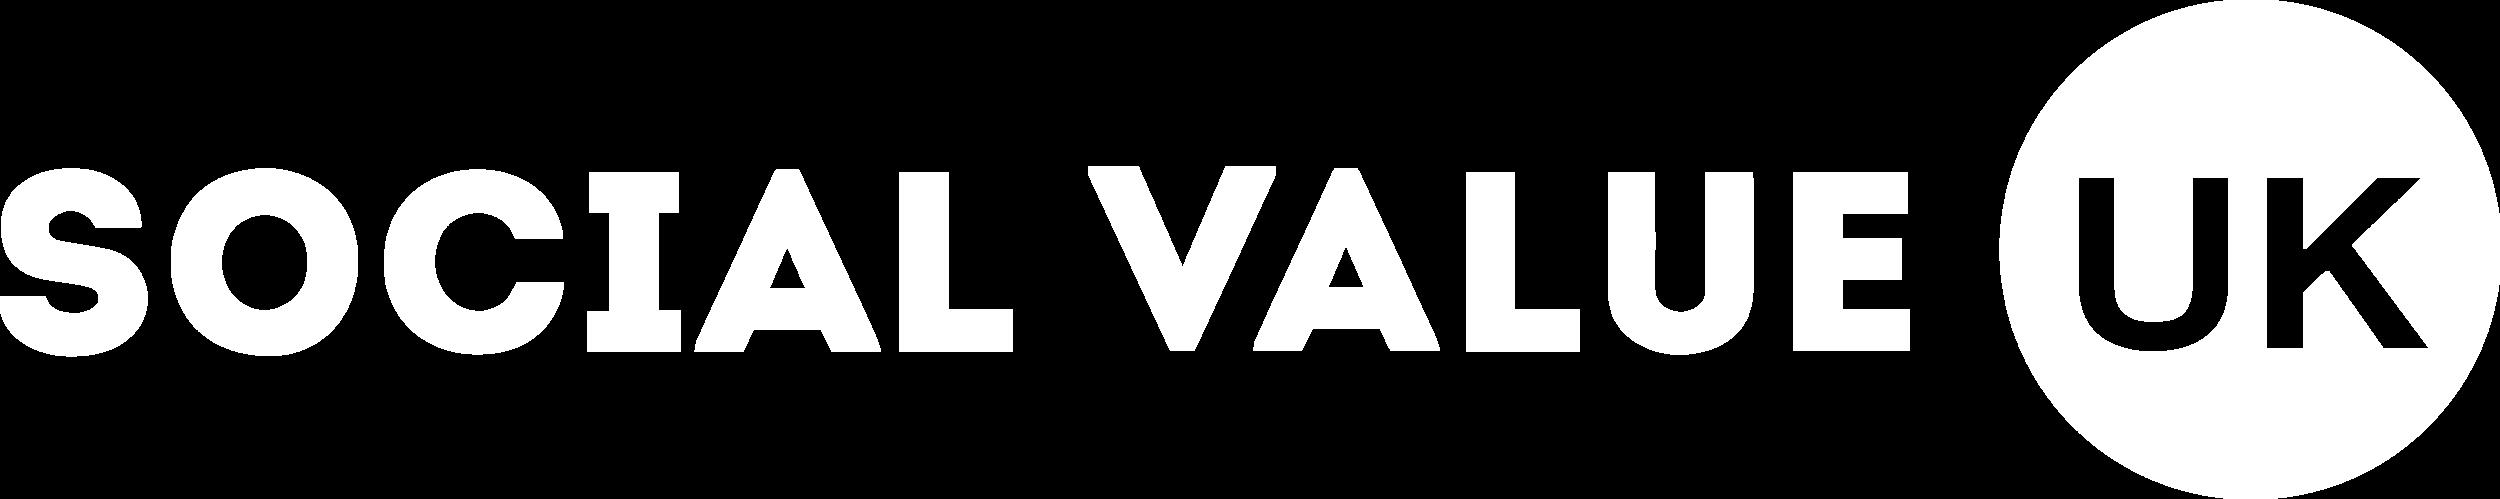 Social Value UK_White Mono Logo.png